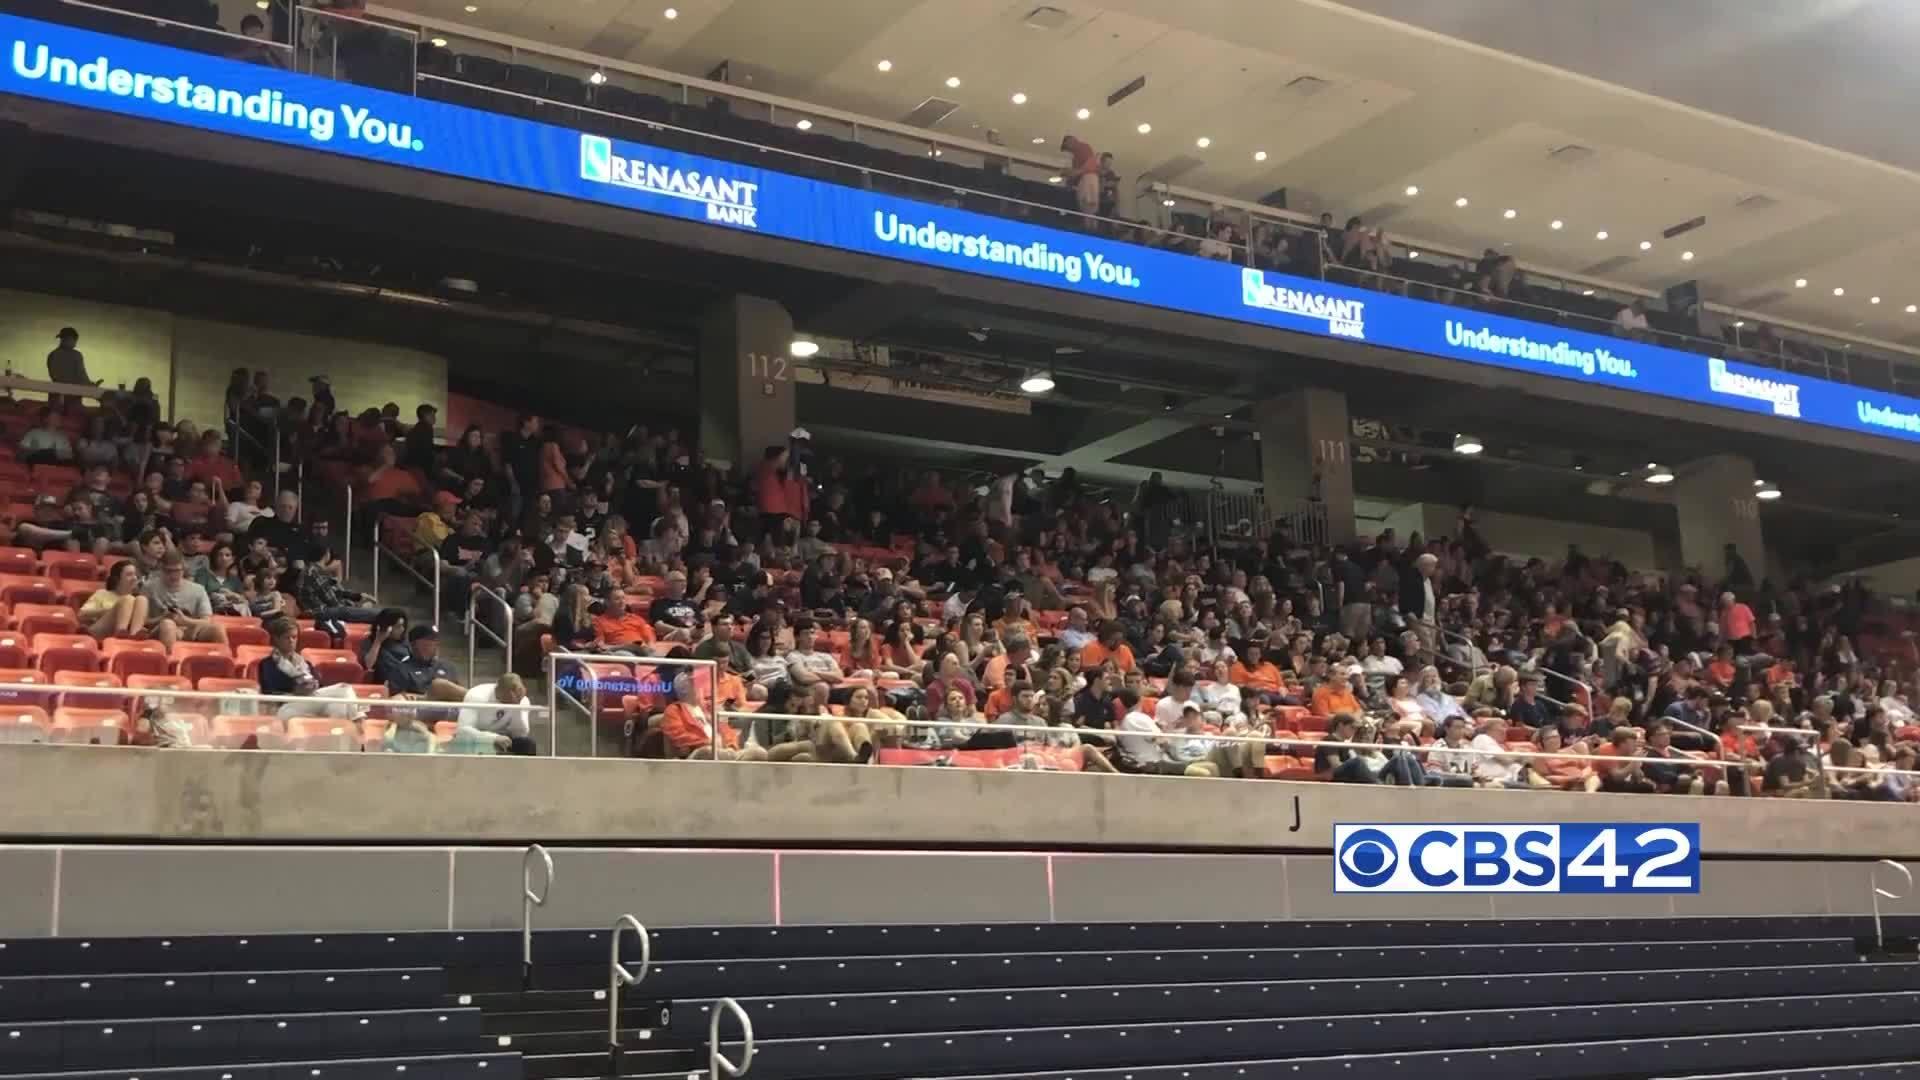 Fans at Auburn Arena